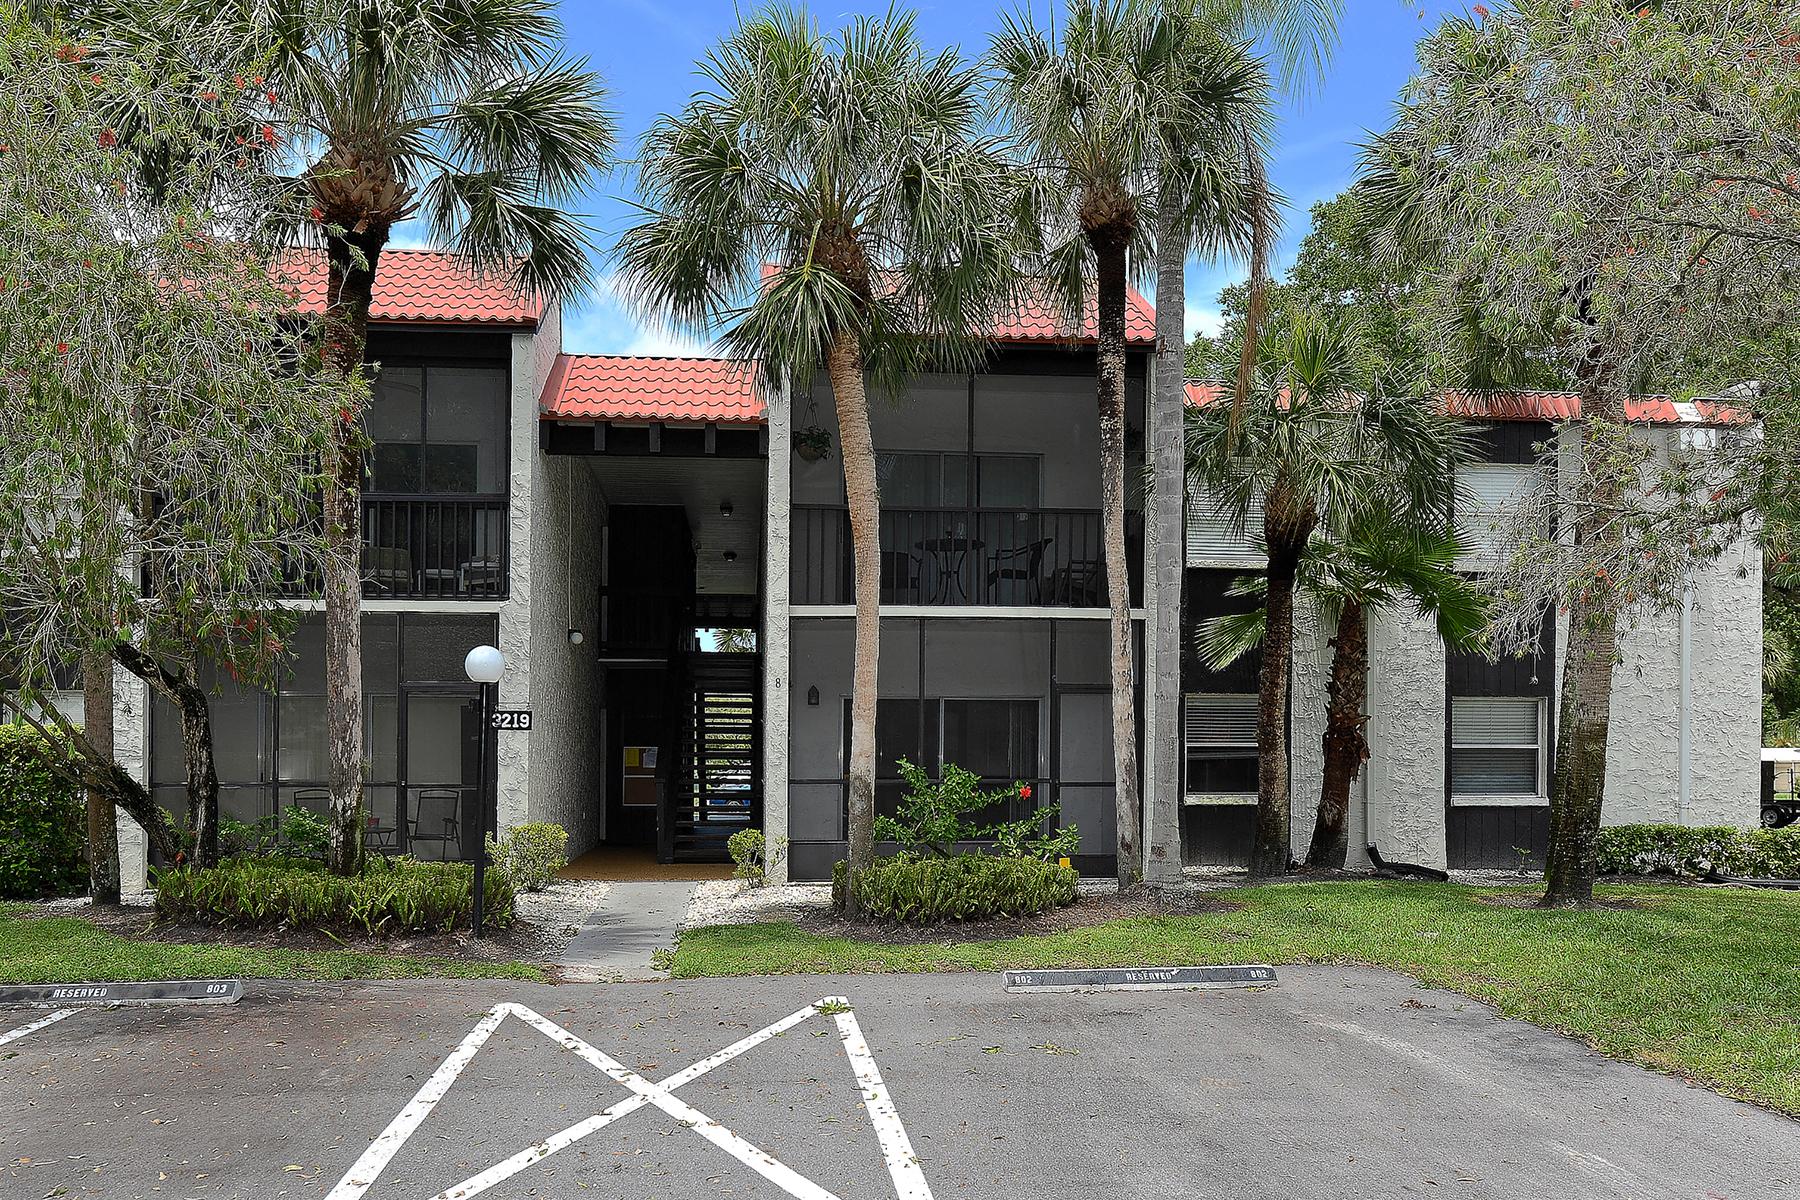 Condomínio para Venda às SARASOTA 3219 Beneva Rd 104 Sarasota, Florida, 34232 Estados Unidos